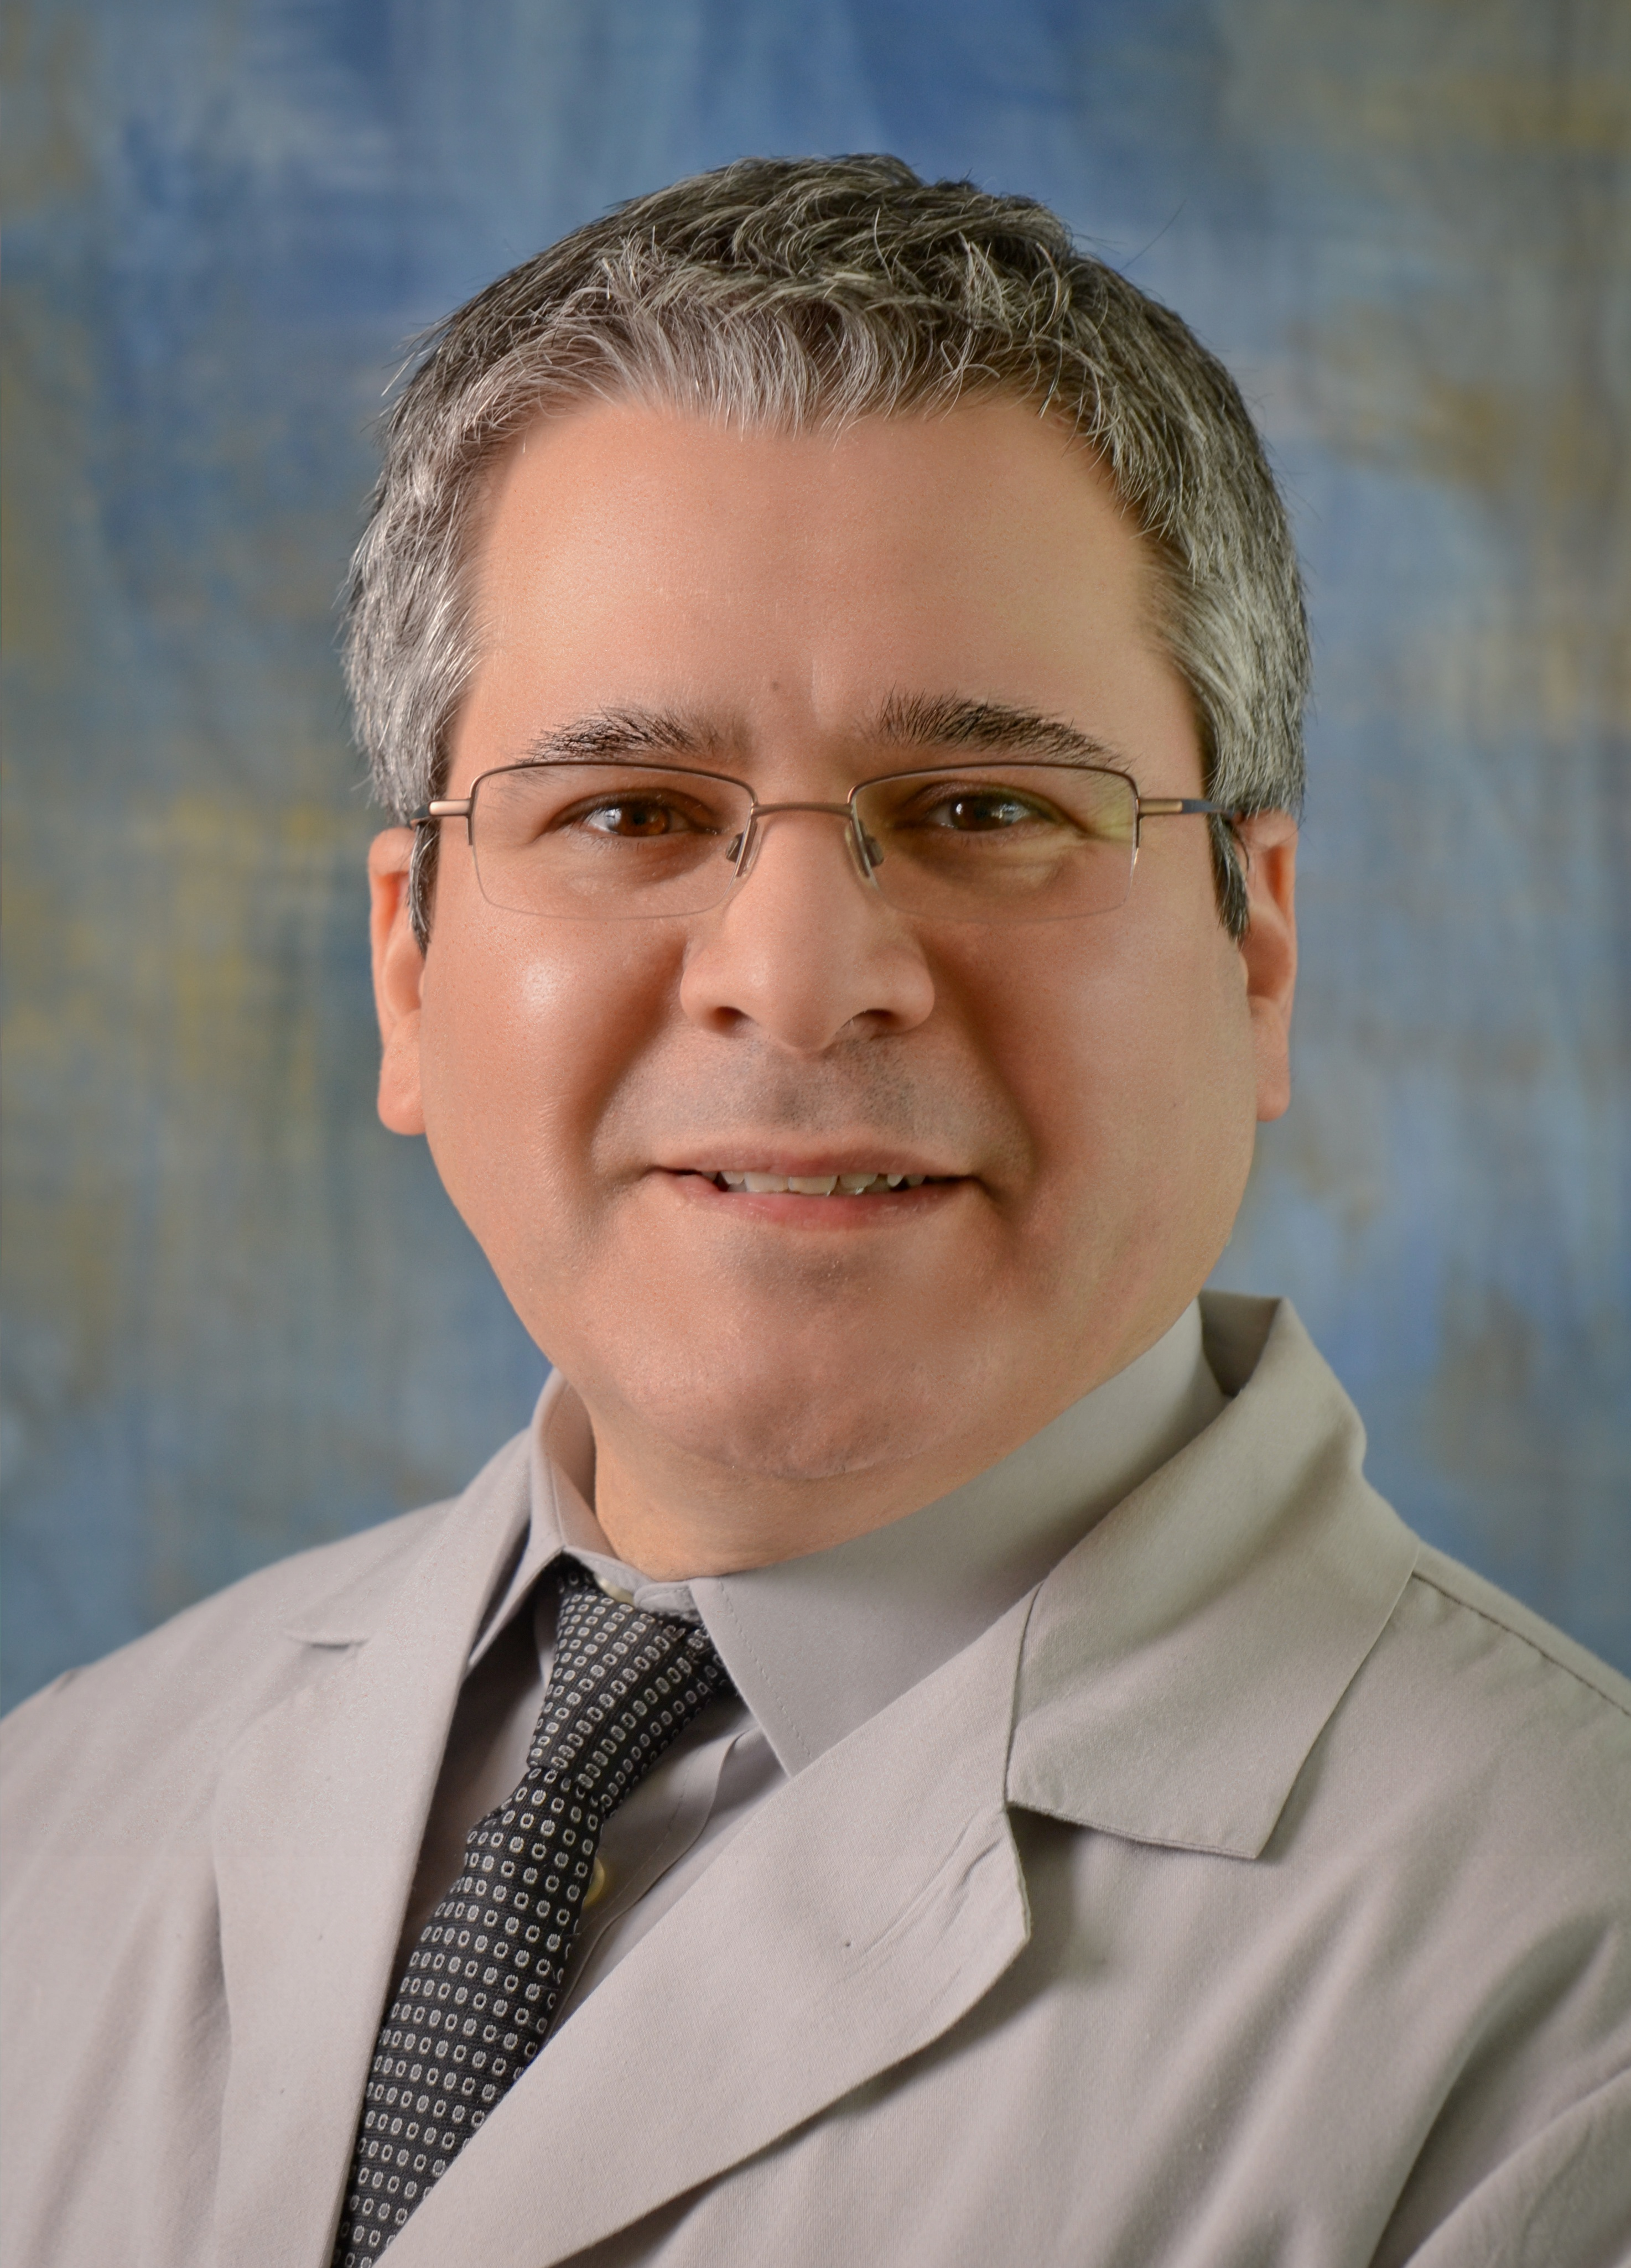 Alan G. Micco, MD